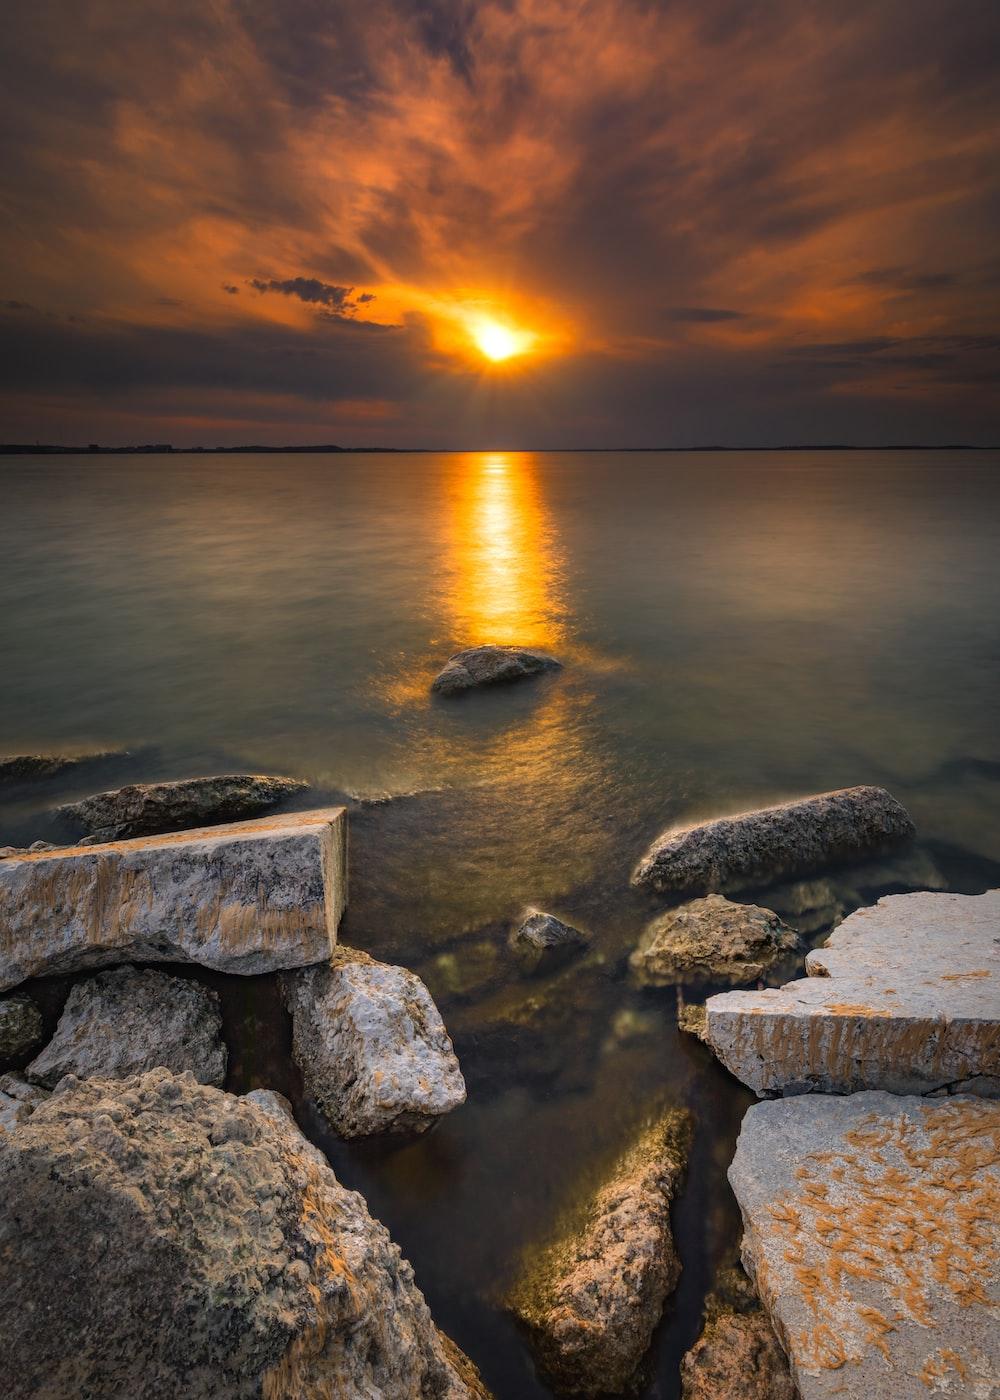 gray rocks on sea during sunset